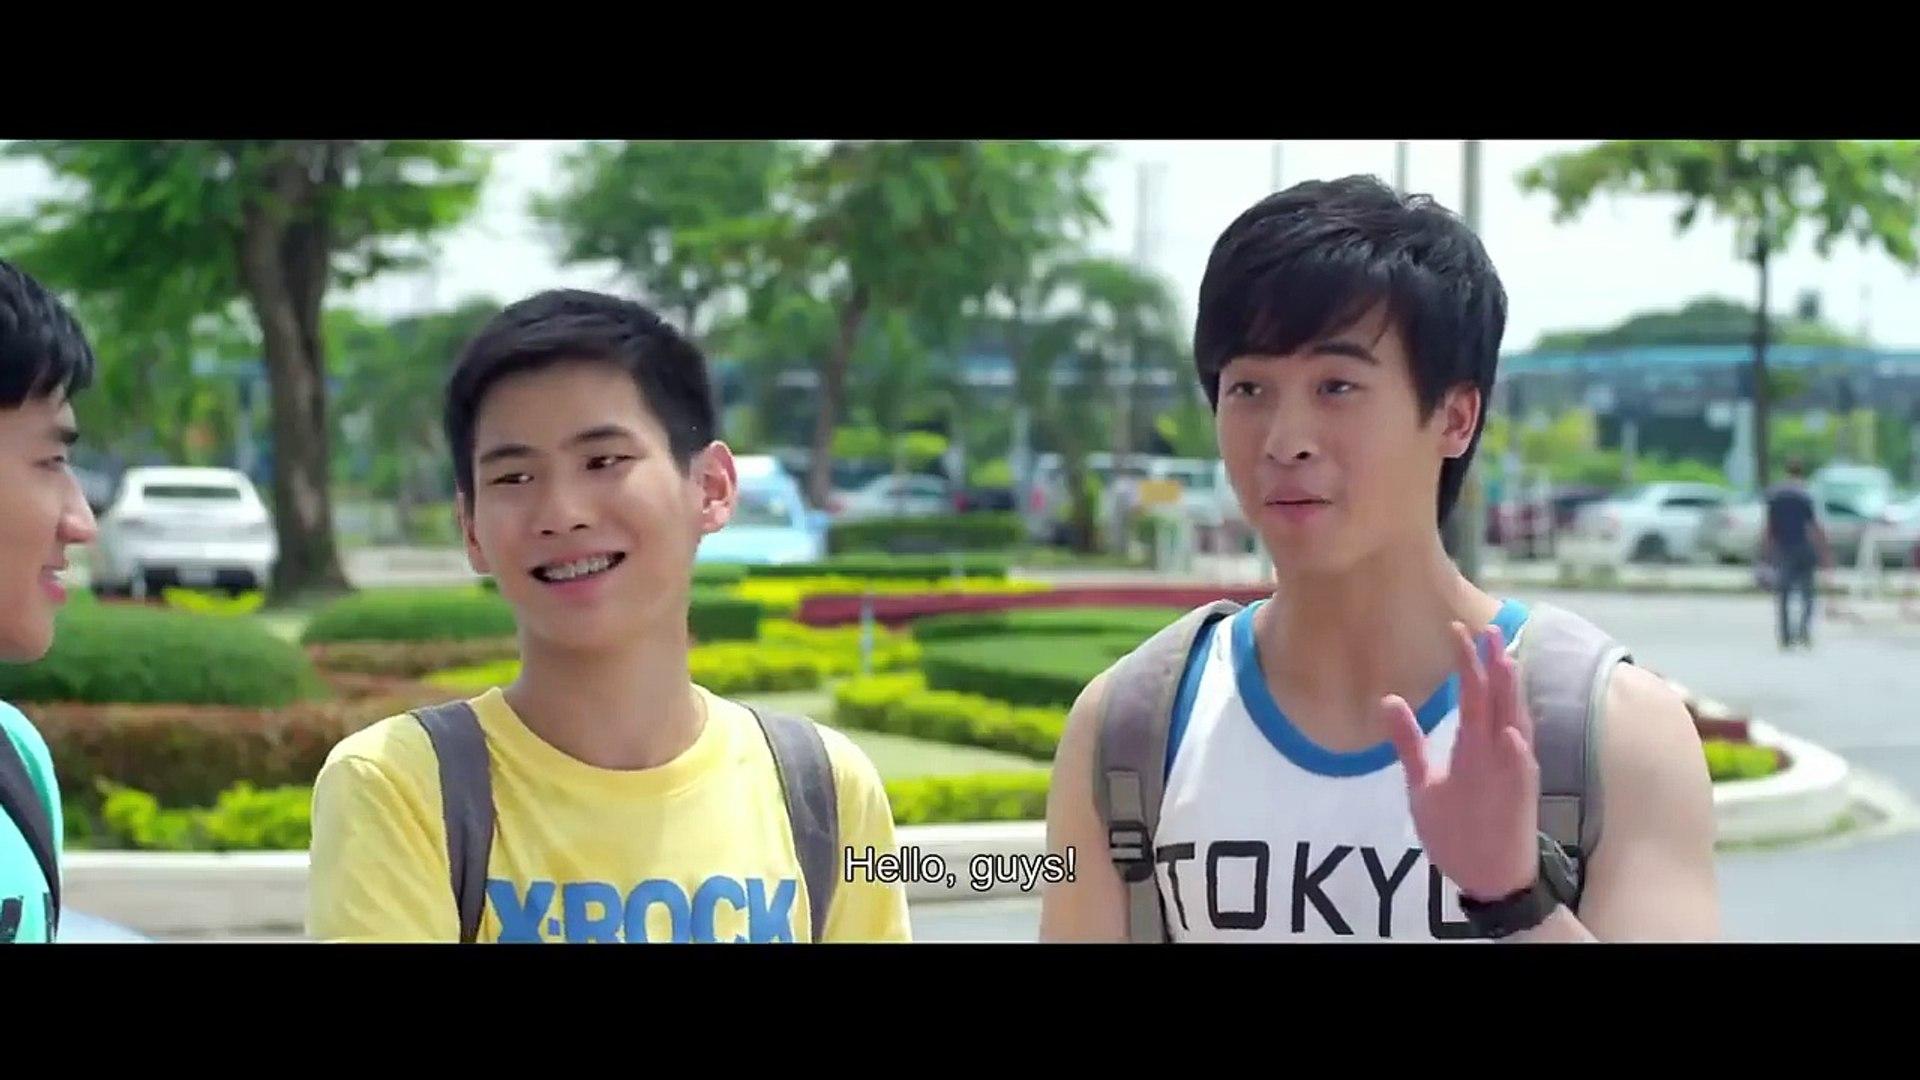 Sweet Boy Trailer-Sweet Boy Trailer-Sweet Boy Trailer-